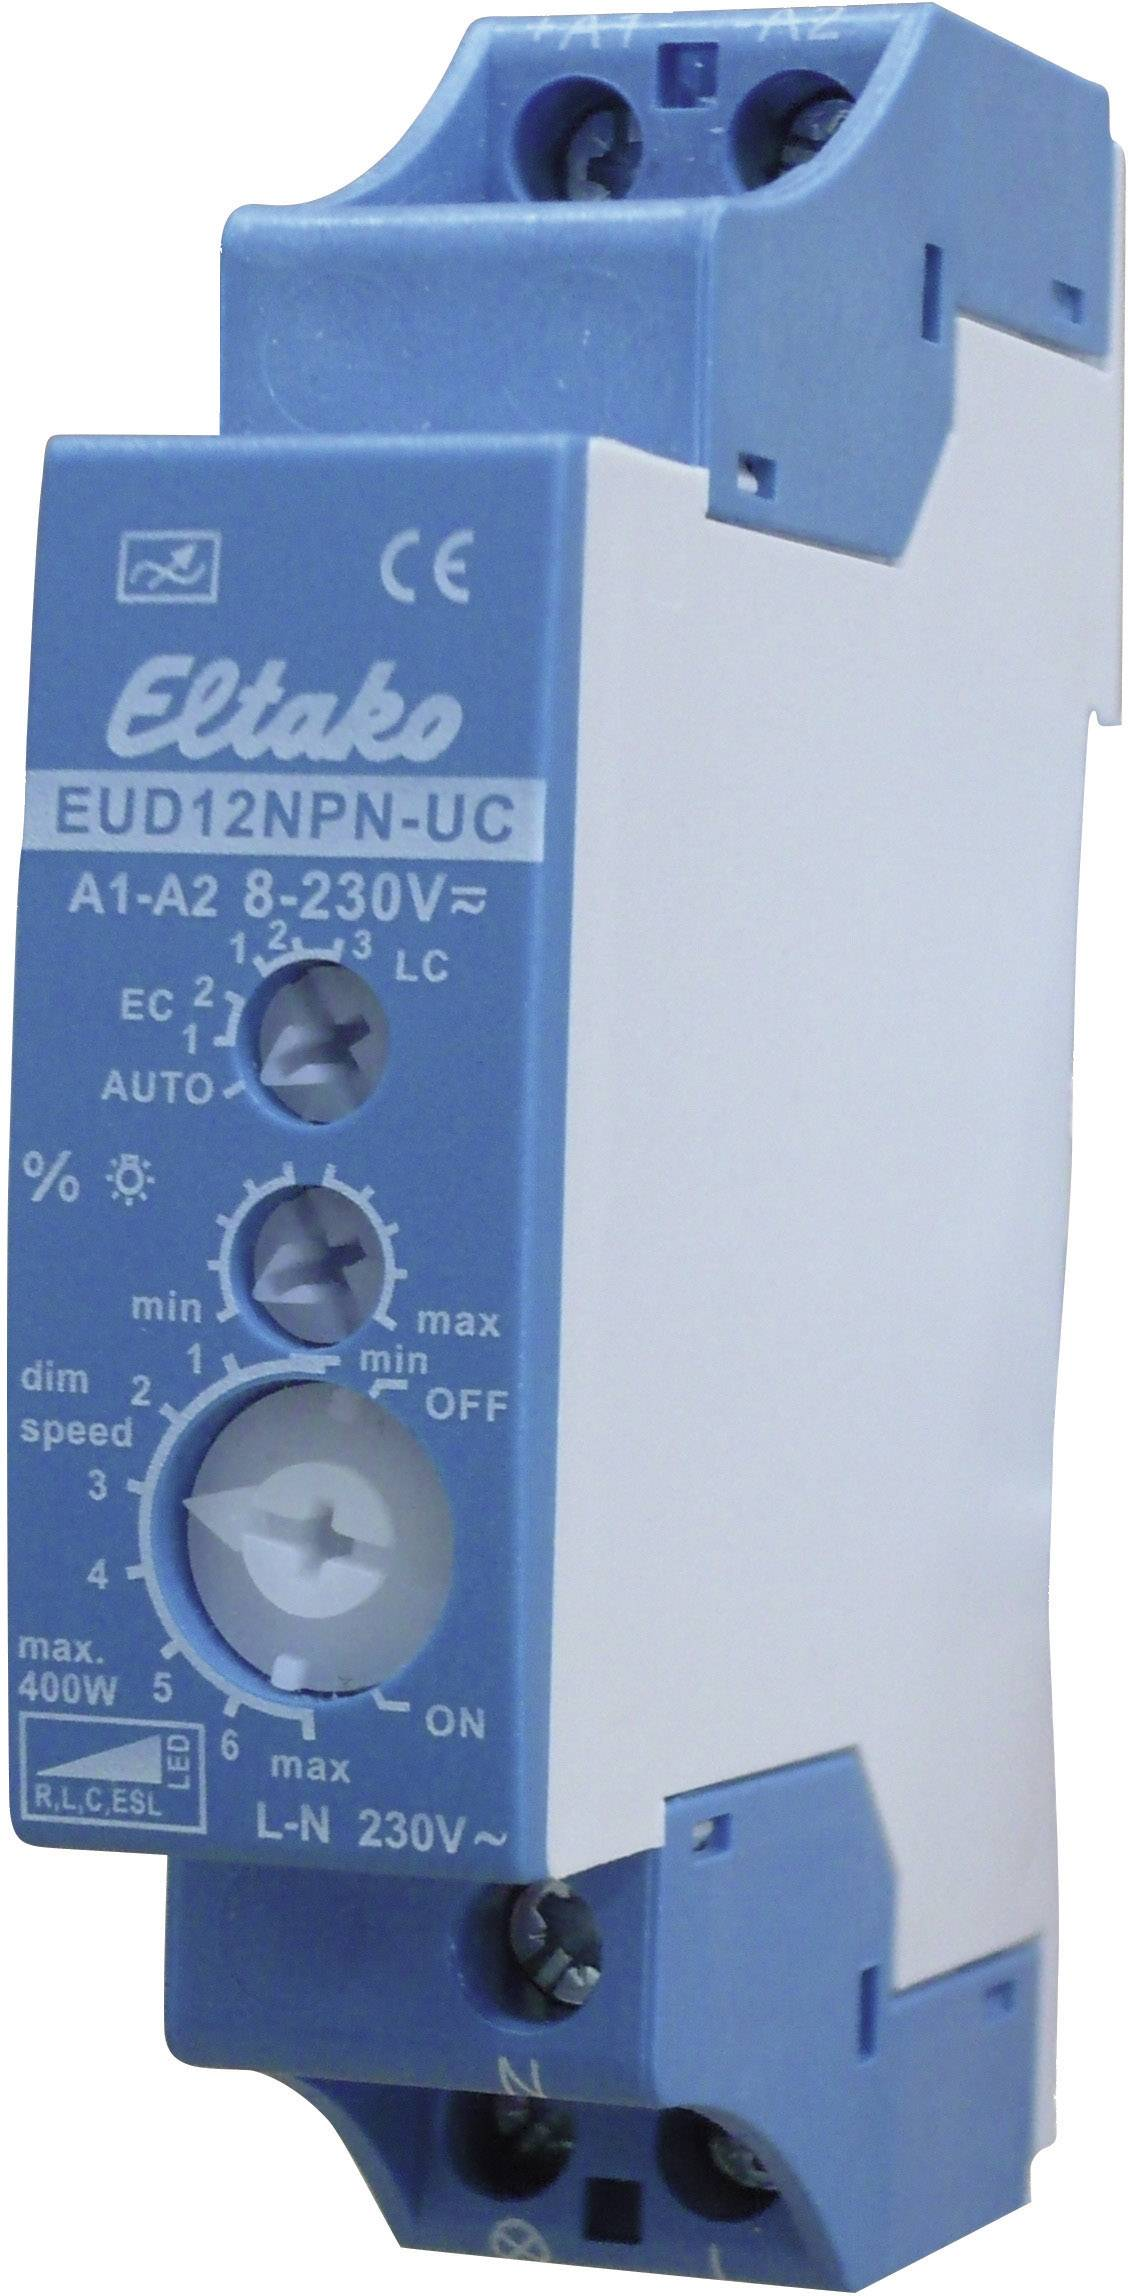 Univerzálny stmievač Eltako EUD12NPN-UC